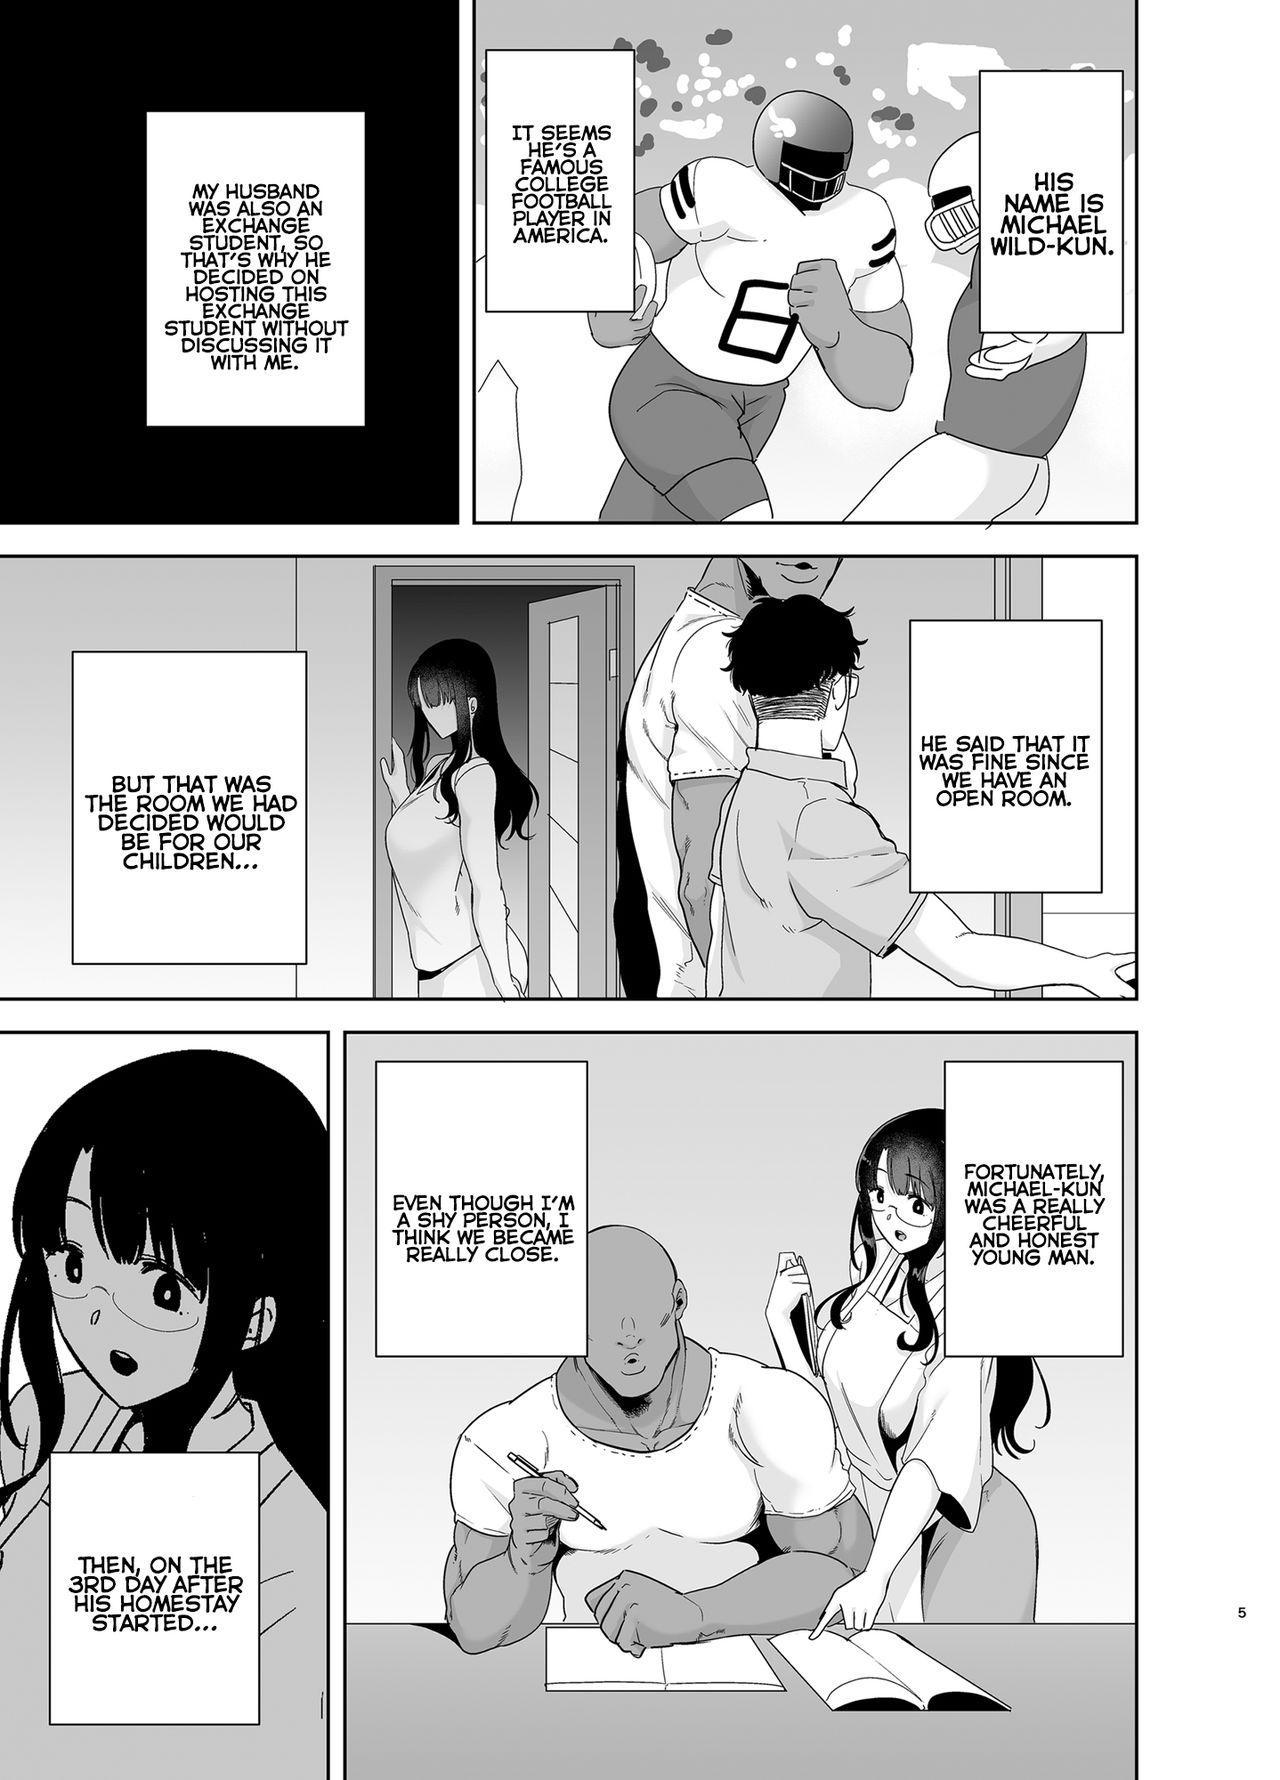 [DOLL PLAY (Kurosu Gatari)] Wild-shiki Nihonjin Tsuma no Netorikata Sono Ichi   Wild Method - How to Steal a Japanese Housewife - Part One [English] [Coffedrug] [Digital] 3